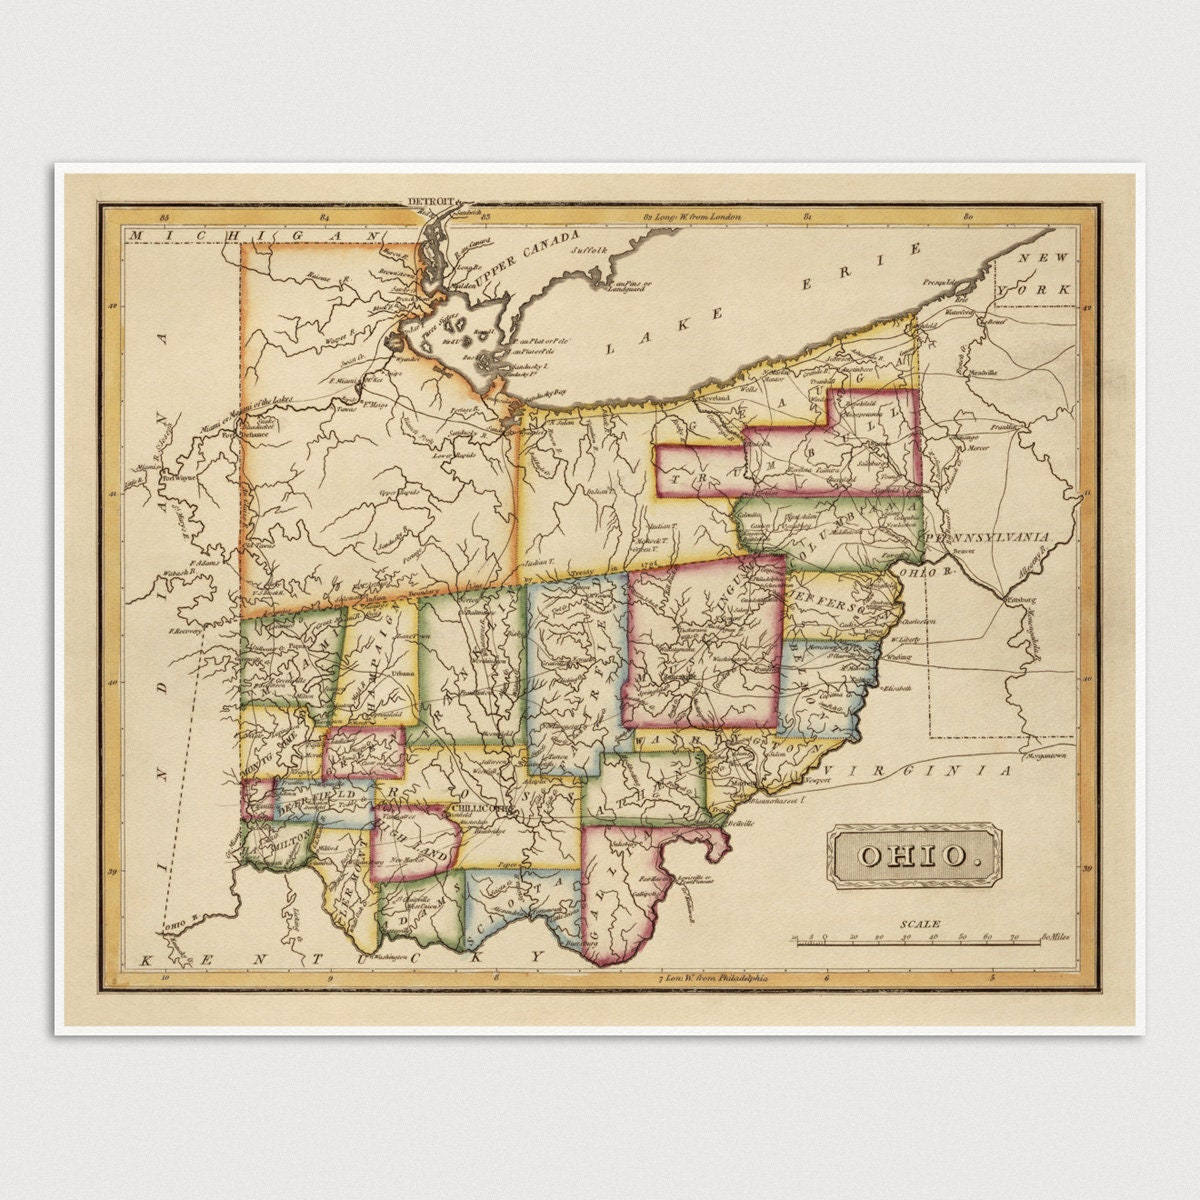 New London Ohio Map.Ohio Map Antique Map Art Print 1817 Archival Reproduction Etsy